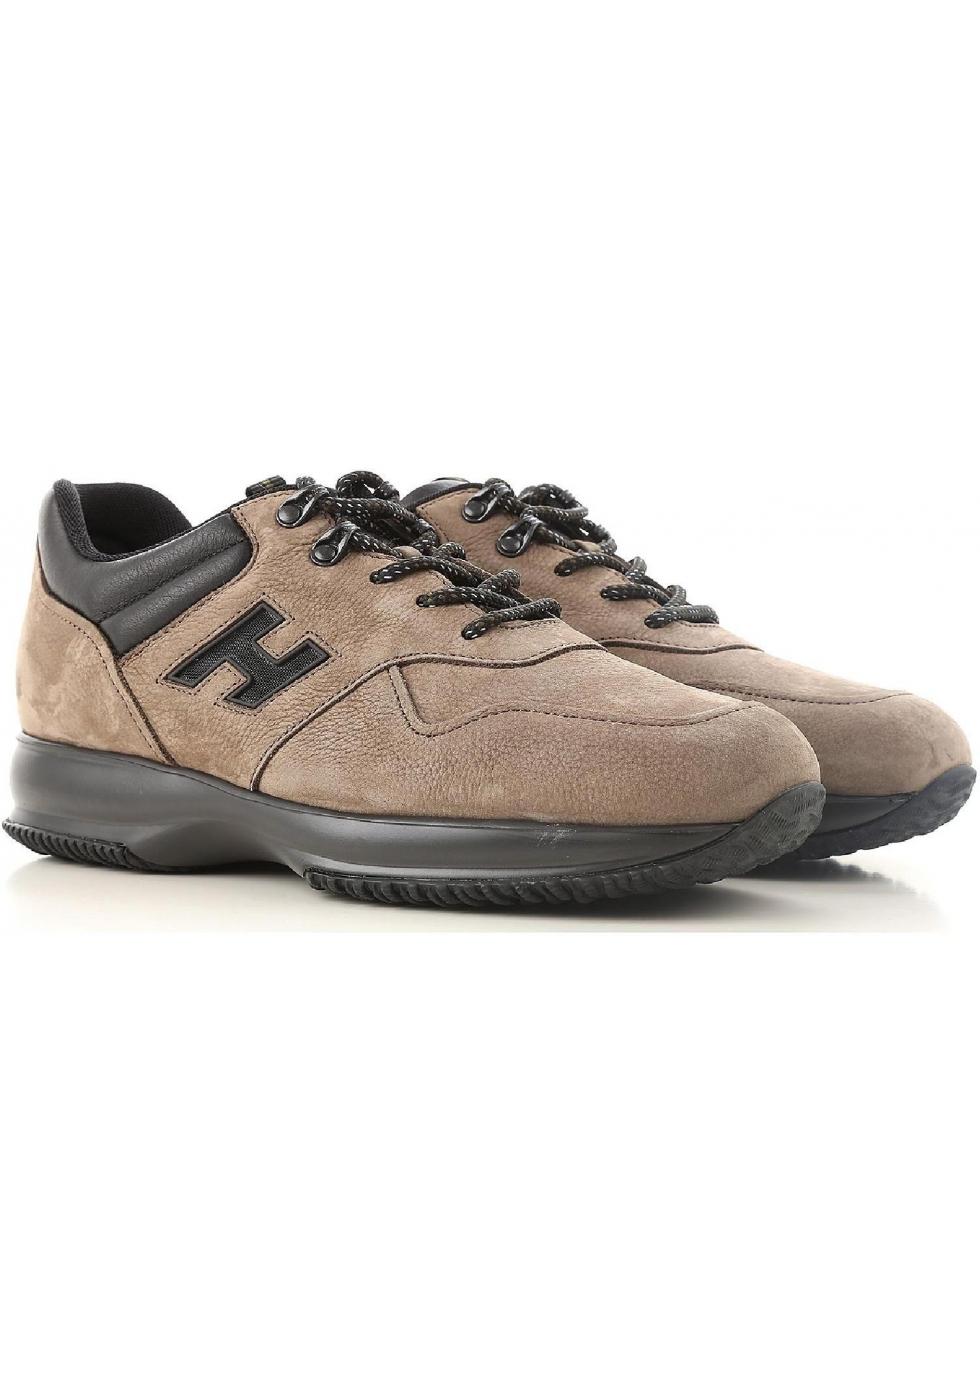 146bd3d939 Hogan INTERACTIVE Sneakers uomo marrone chiaro in pelle nabuk ...